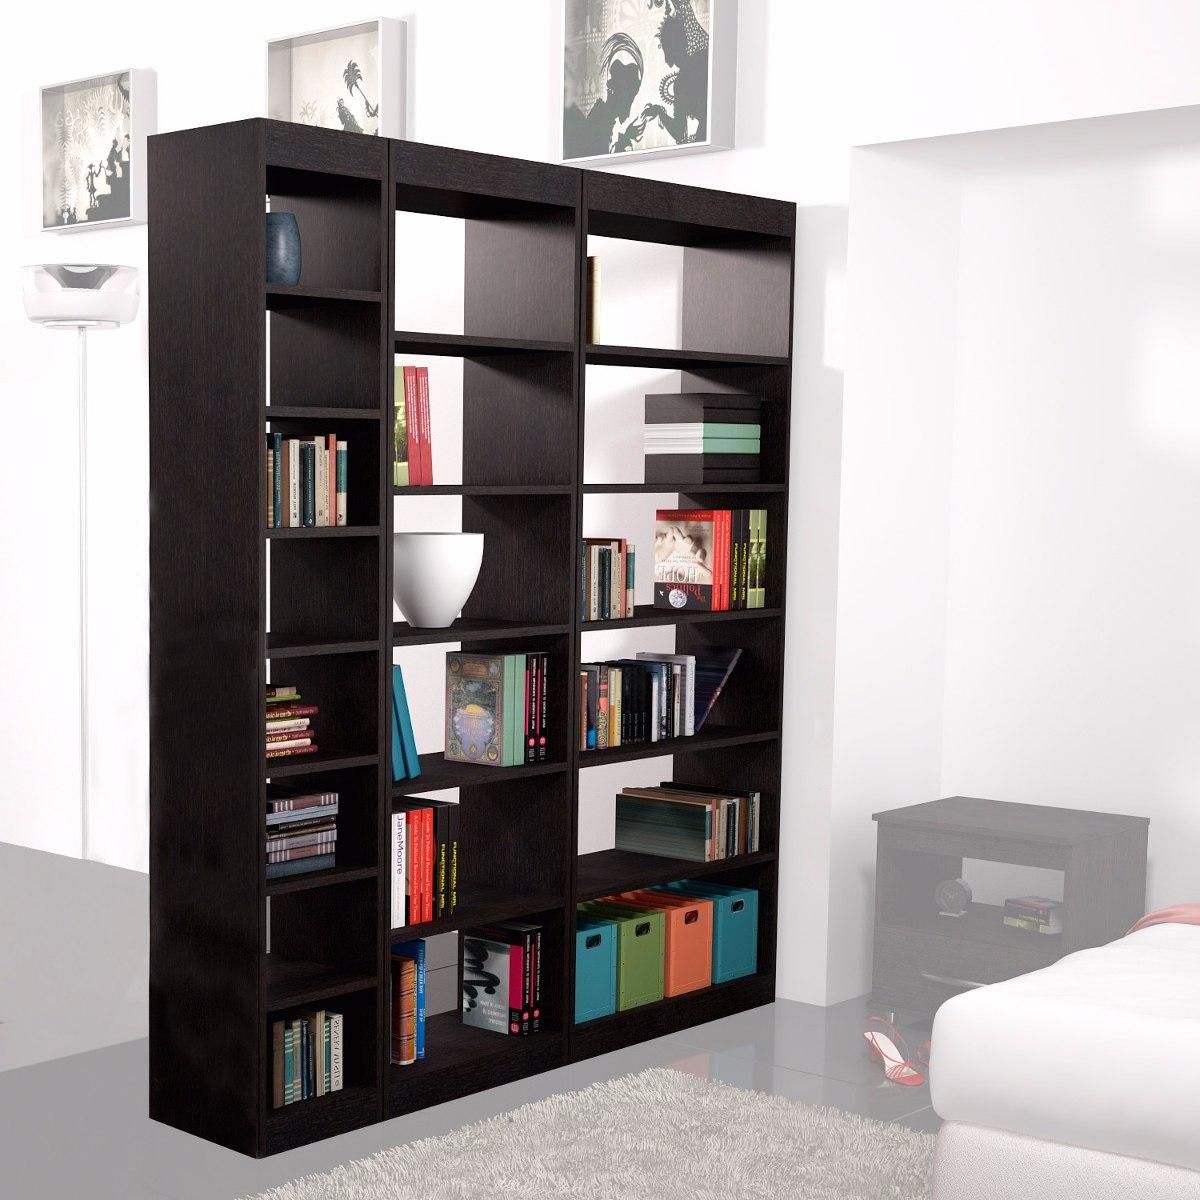 Mueble Divisor De Ambiente Combo Bibliotecas Altas Fiplasto  # Muebles Fiplasto